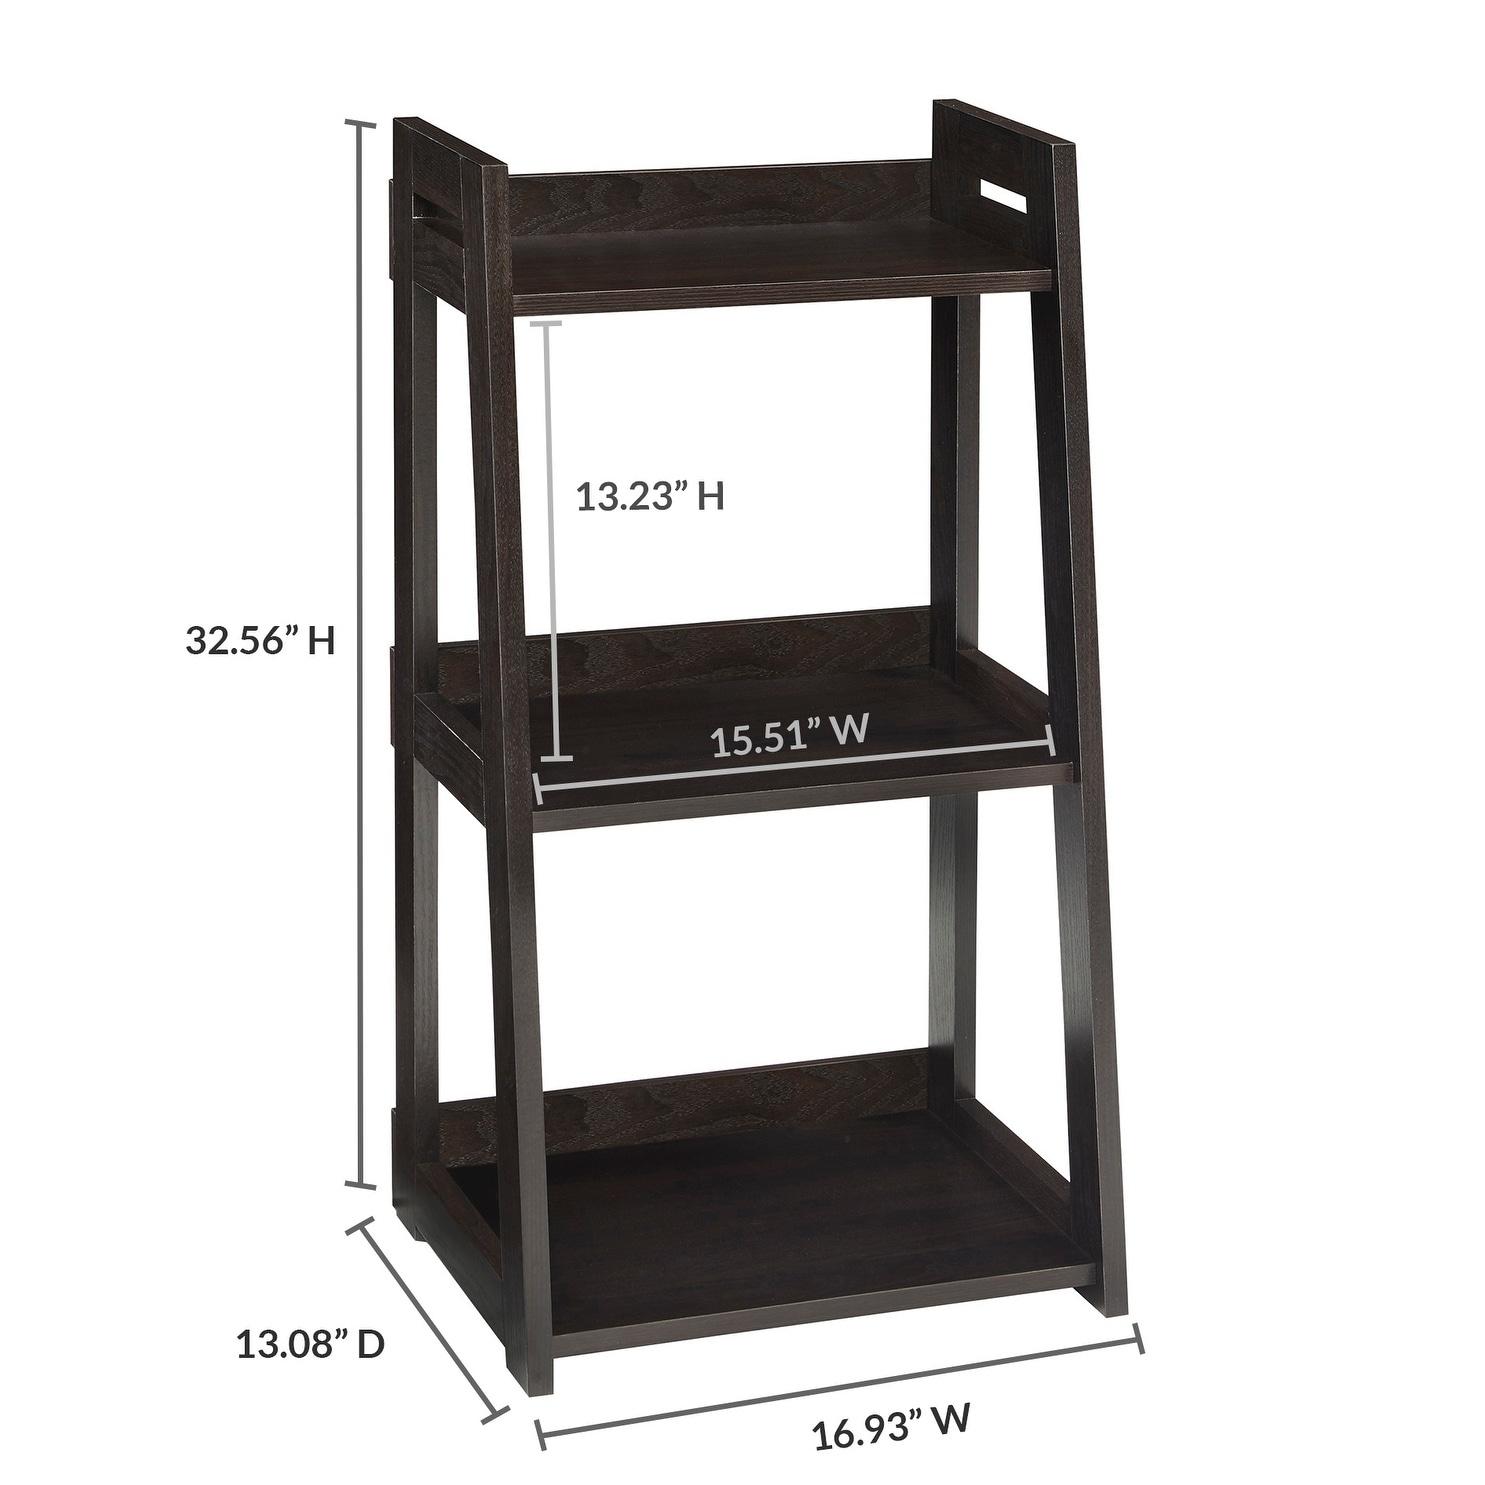 New ClosetMaid No-Tool Assembly Narrow 3-Tier Ladder Shelf - Free  PS96